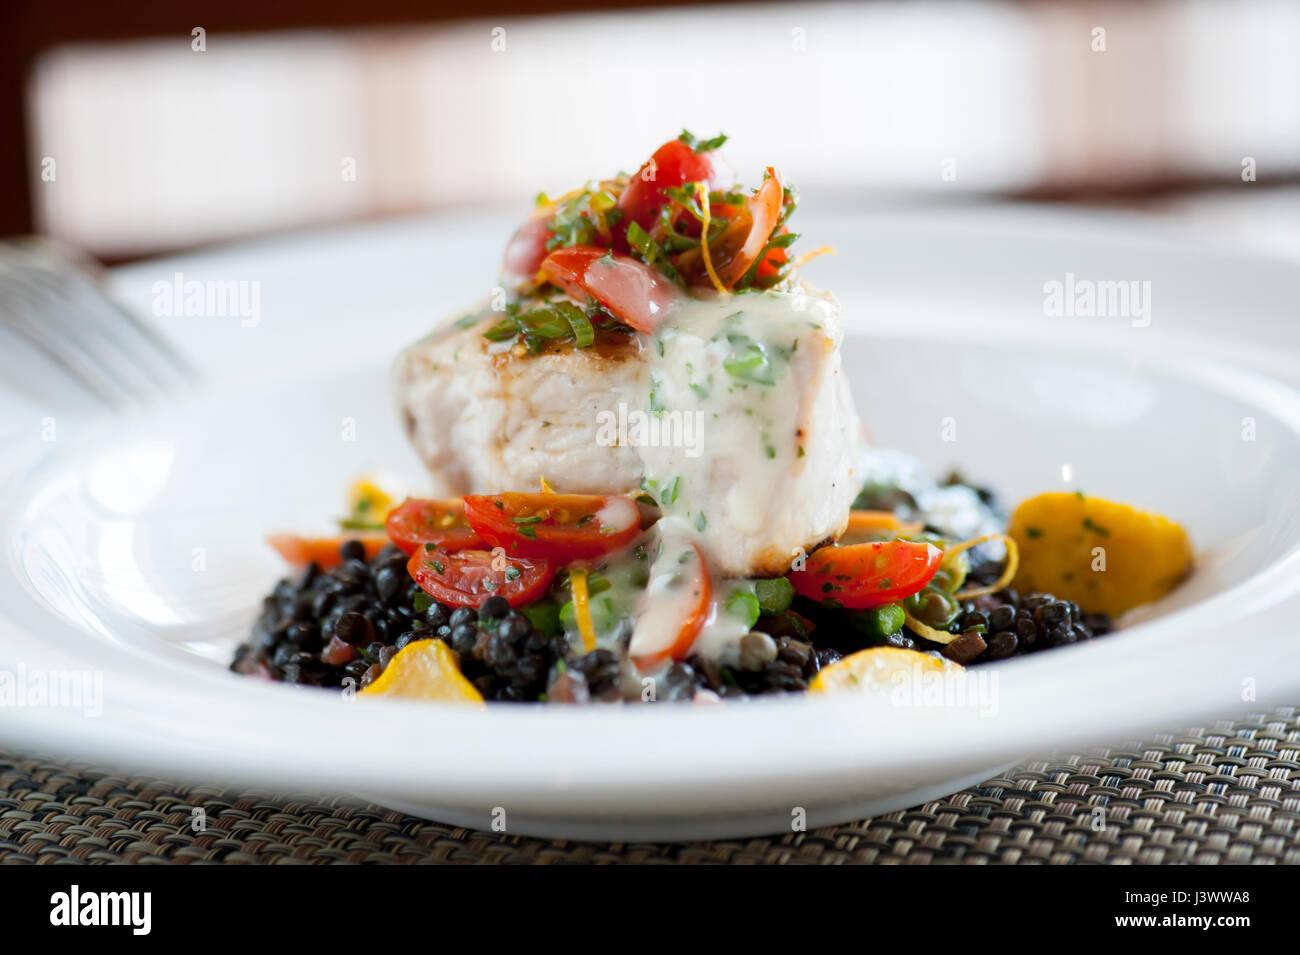 usa-food-swordfish-steak-on-a-bed-of-len